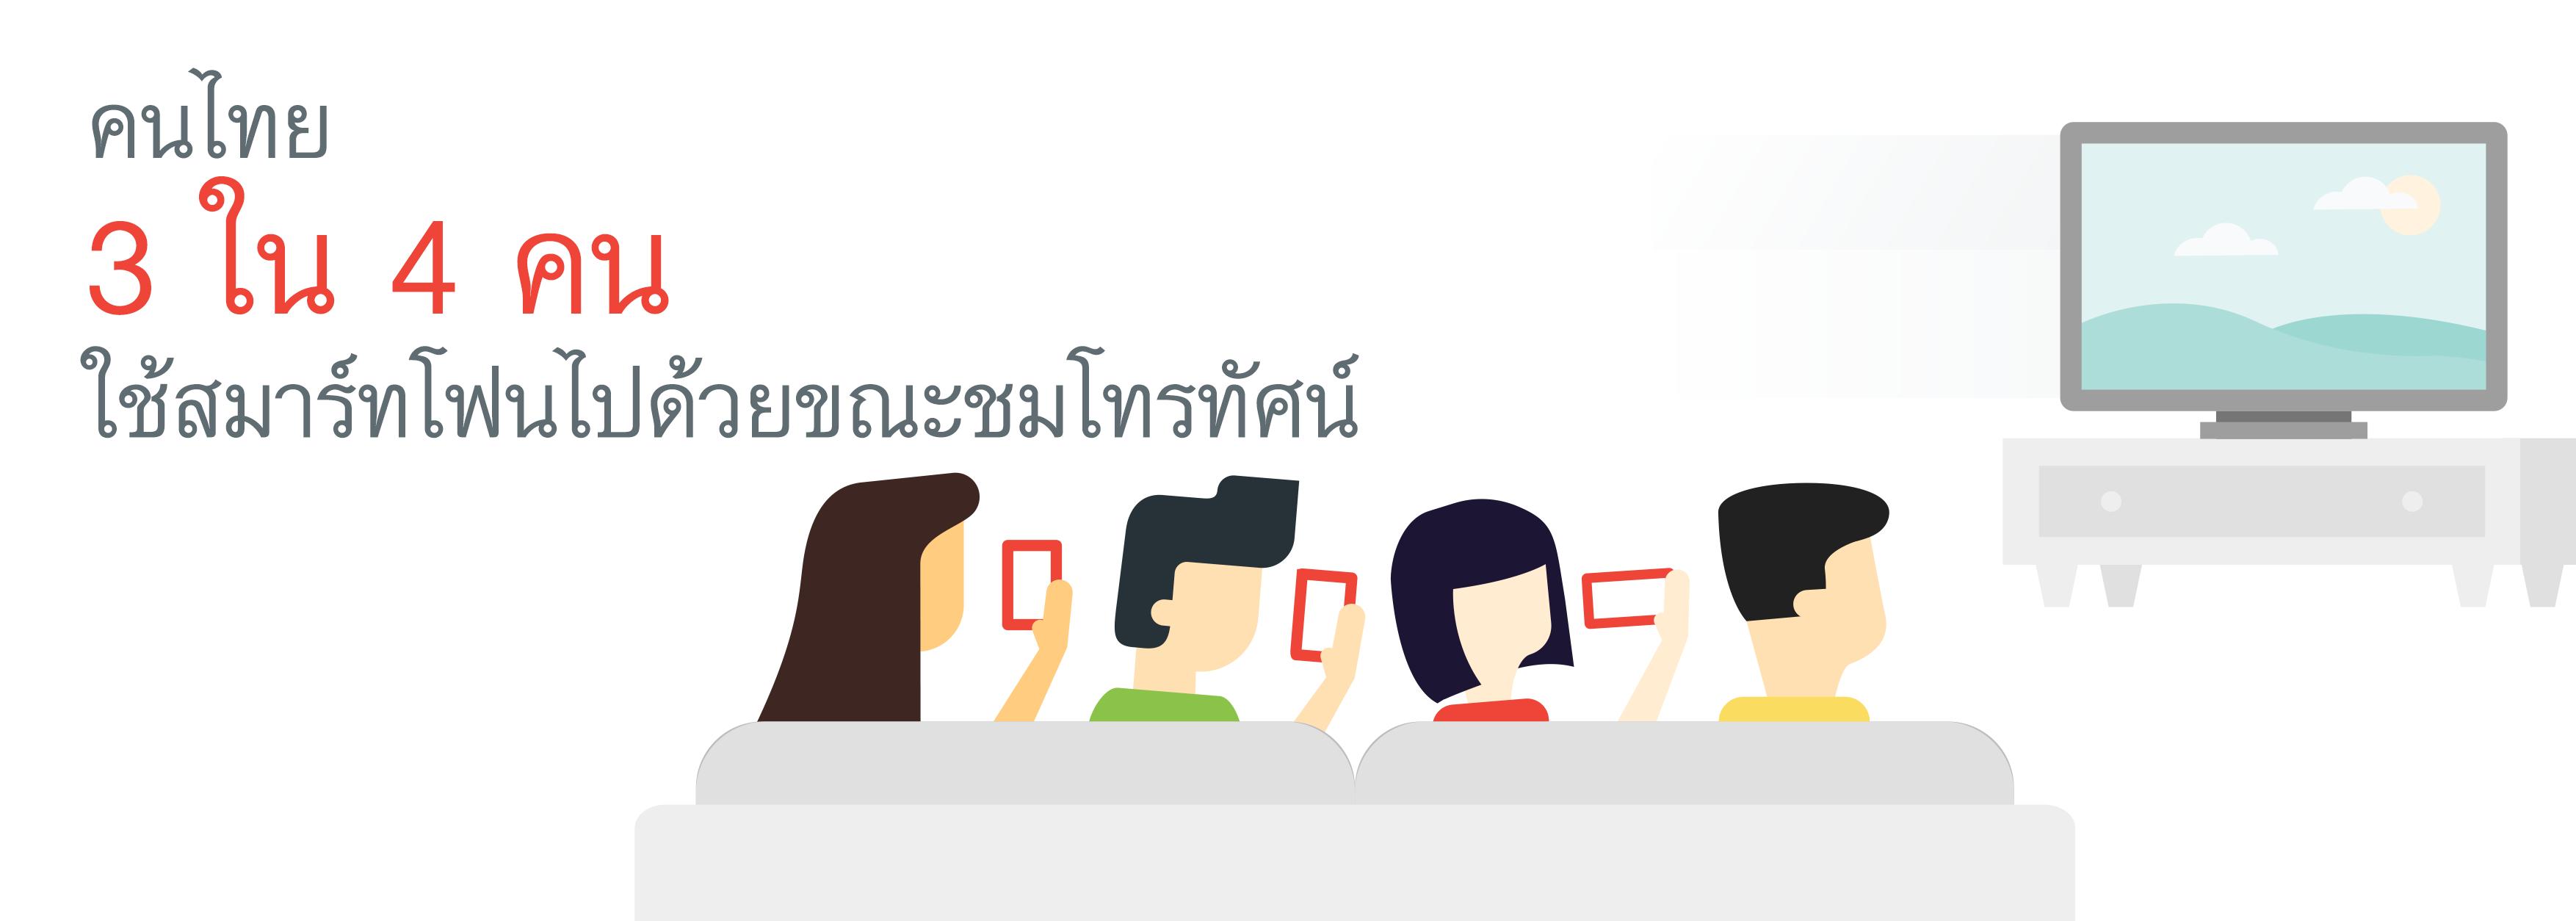 TWG_TH_2a_ThaiAttention_09051717-2